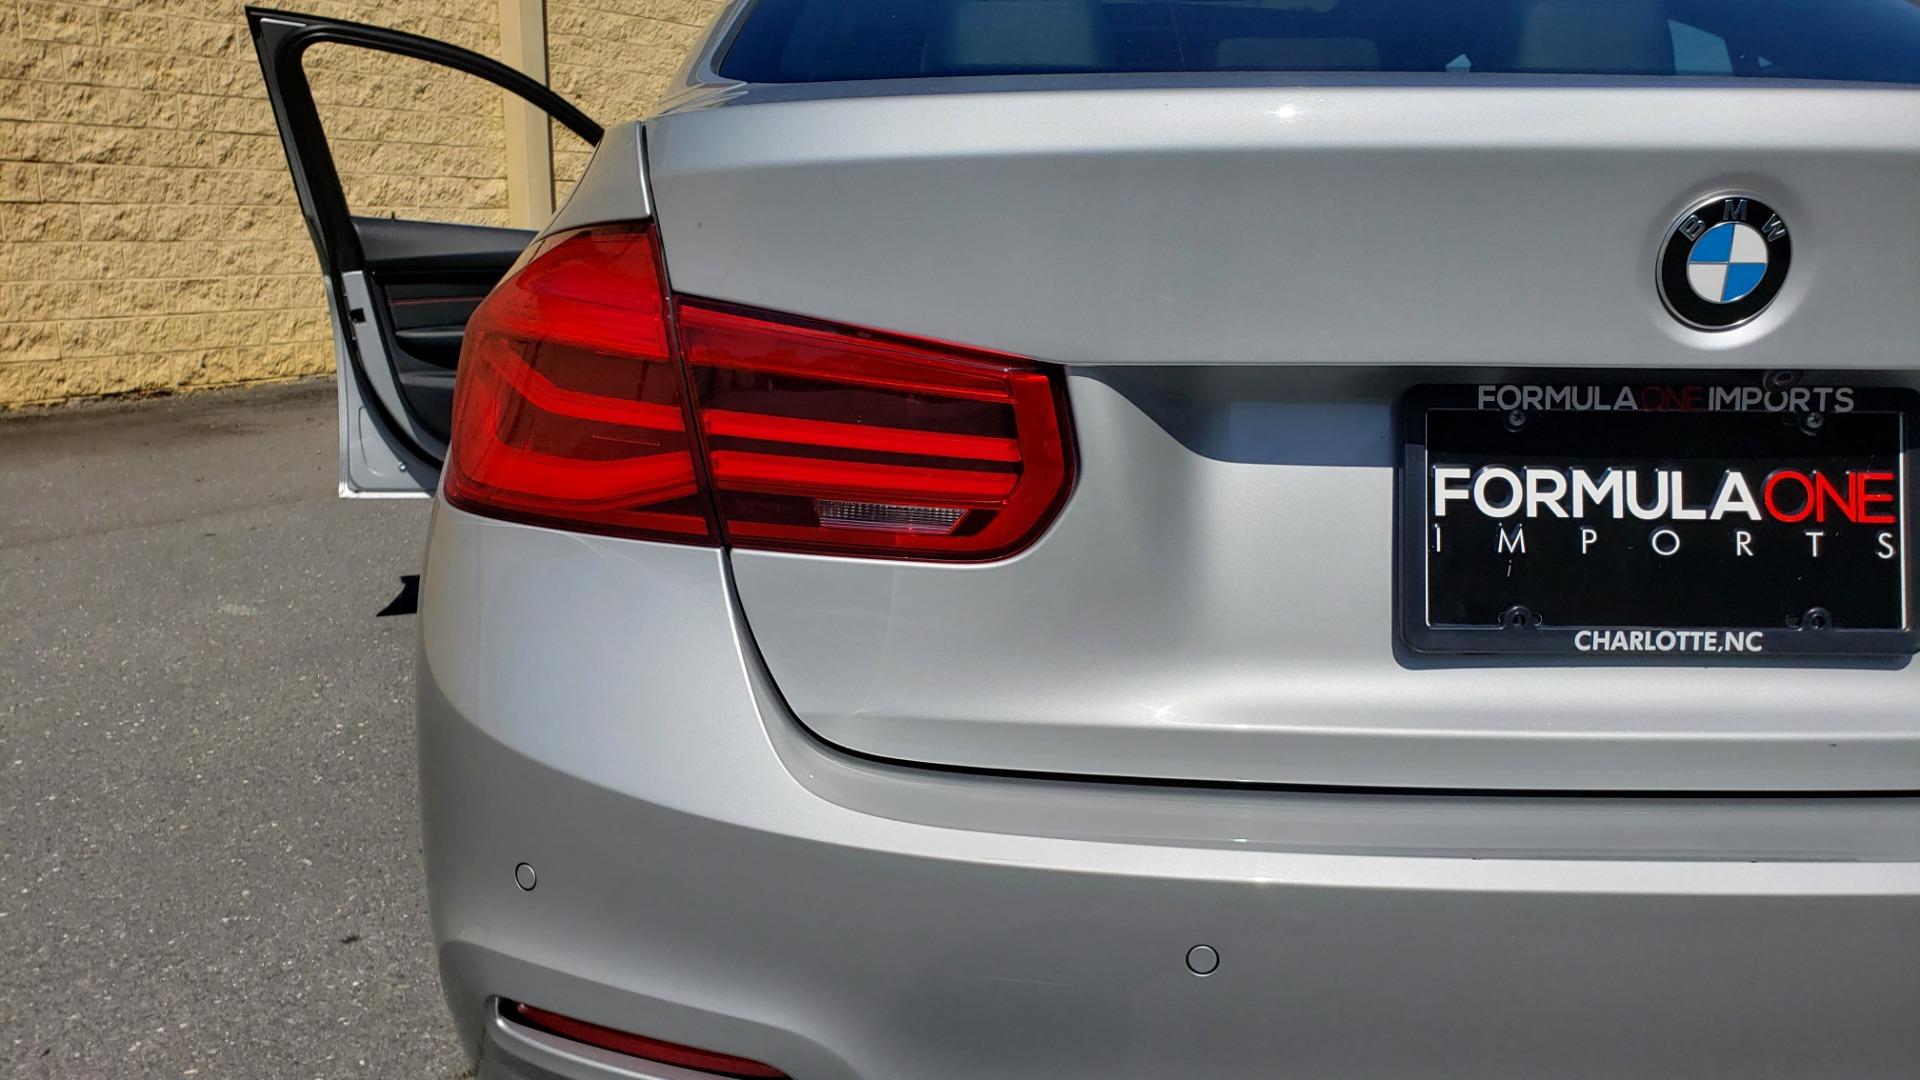 Used 2017 BMW 3 SERIES 330I SPORT SEDAN / DRVR ASST PKG / SUNROOF / REARVIEW for sale Sold at Formula Imports in Charlotte NC 28227 25